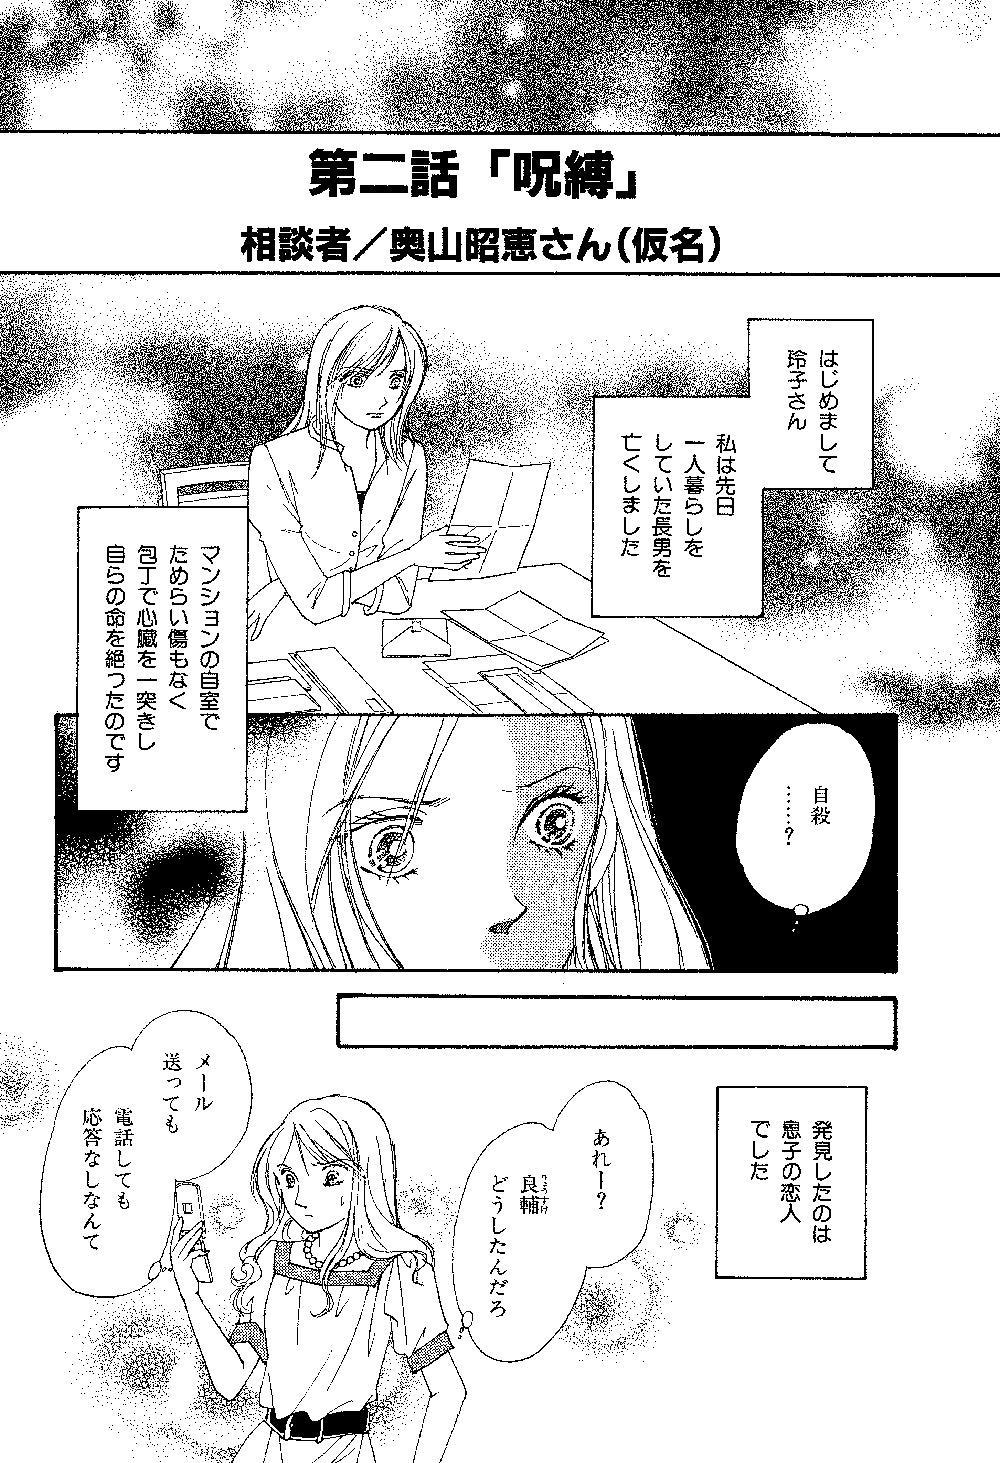 mayuri_0001_0021.jpg